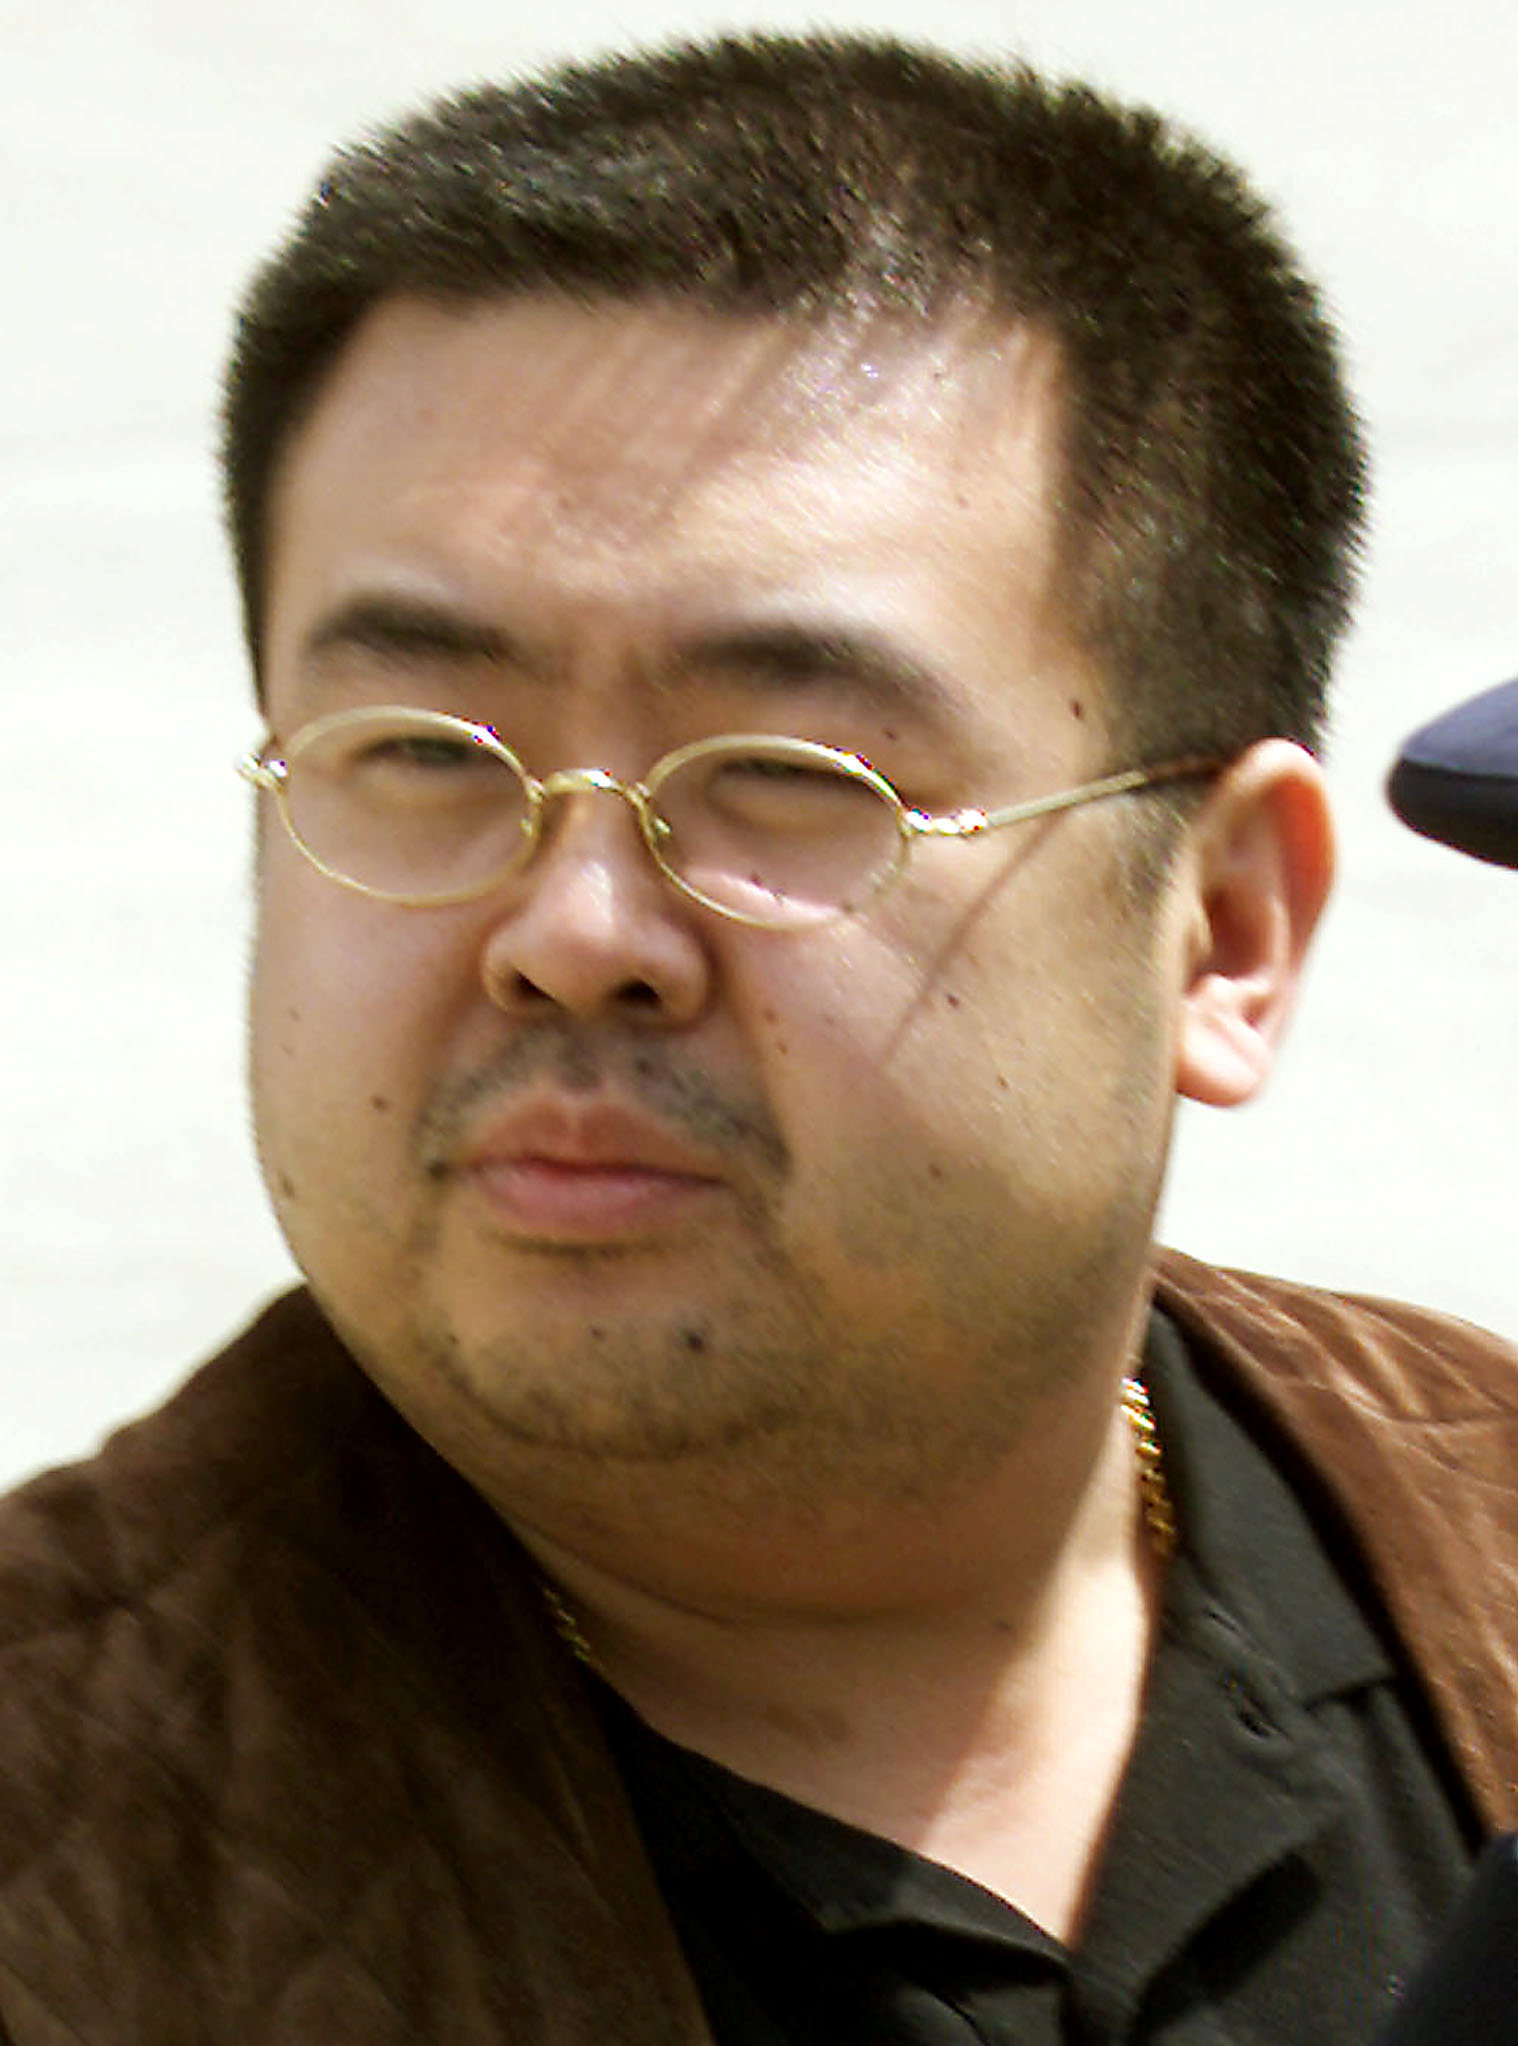 Kim Jong Nam, hermano del líder norcoreano, Kim Jong-un